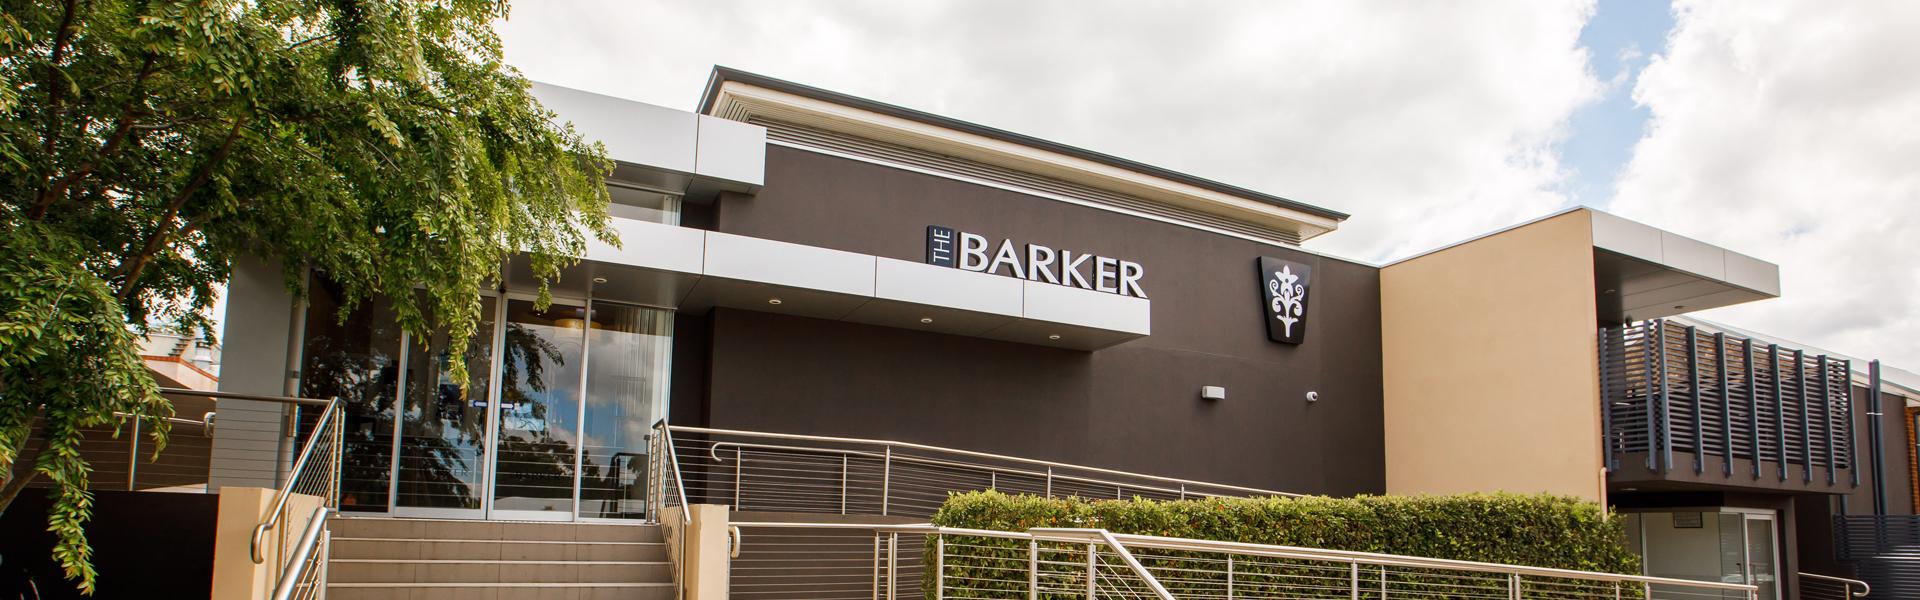 The Barker Hotel